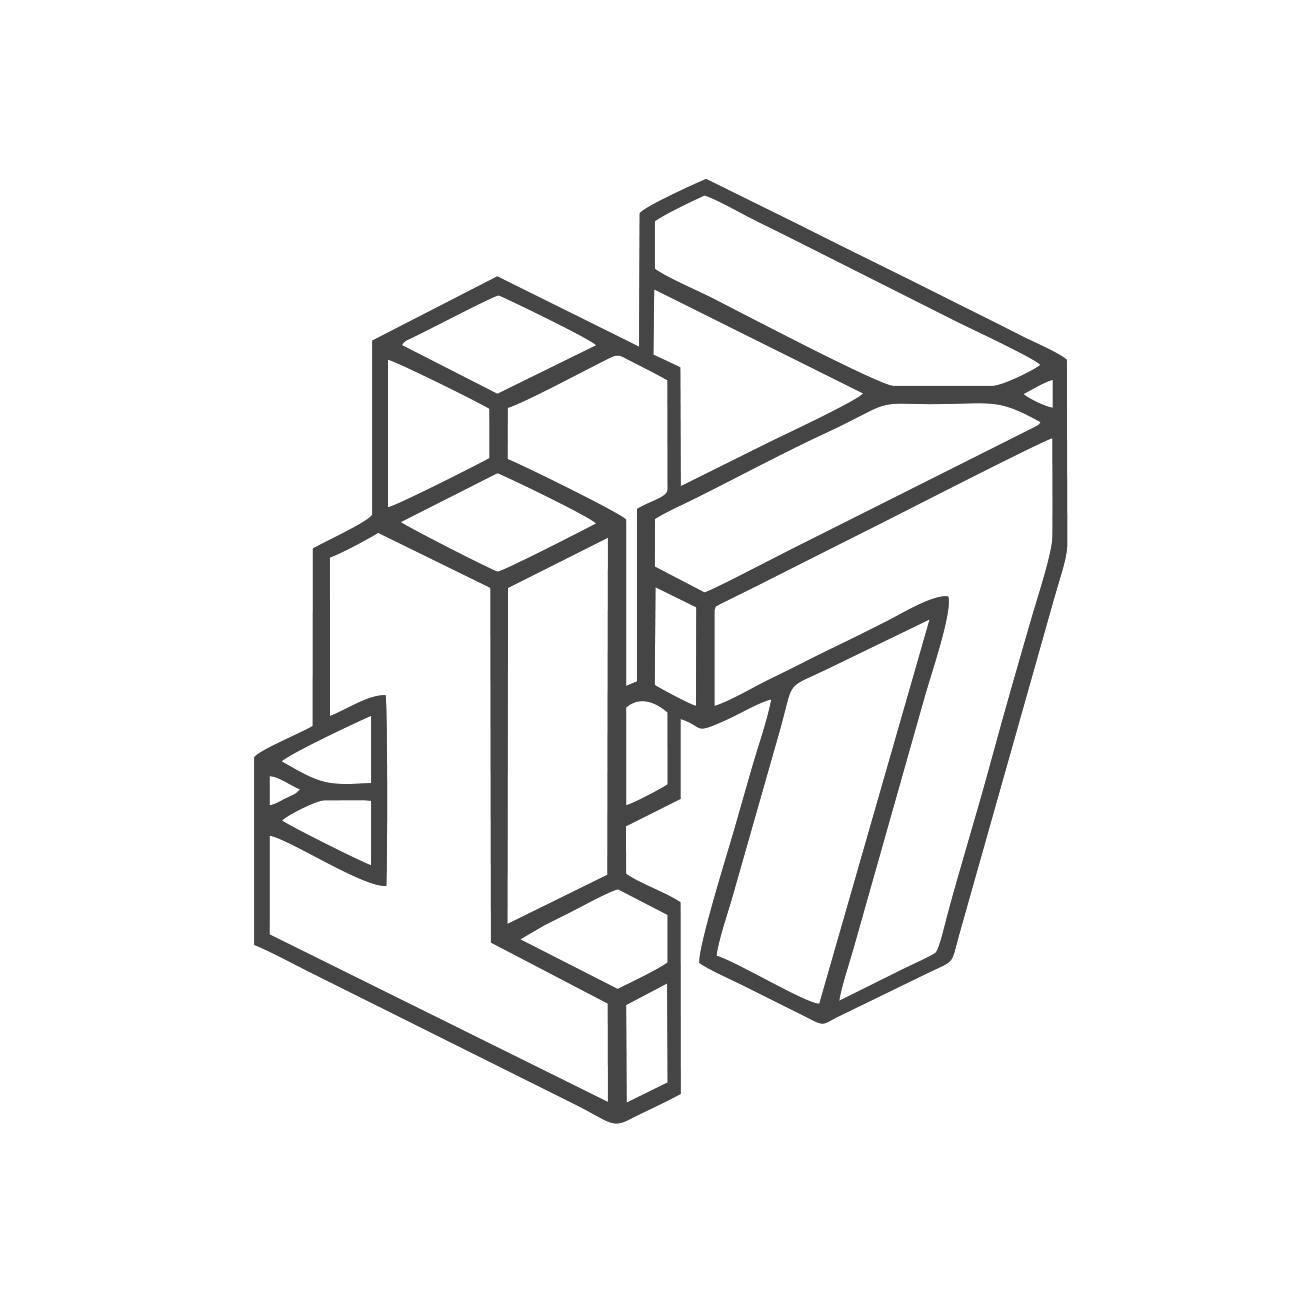 3D Rendering Solaris17 Logo